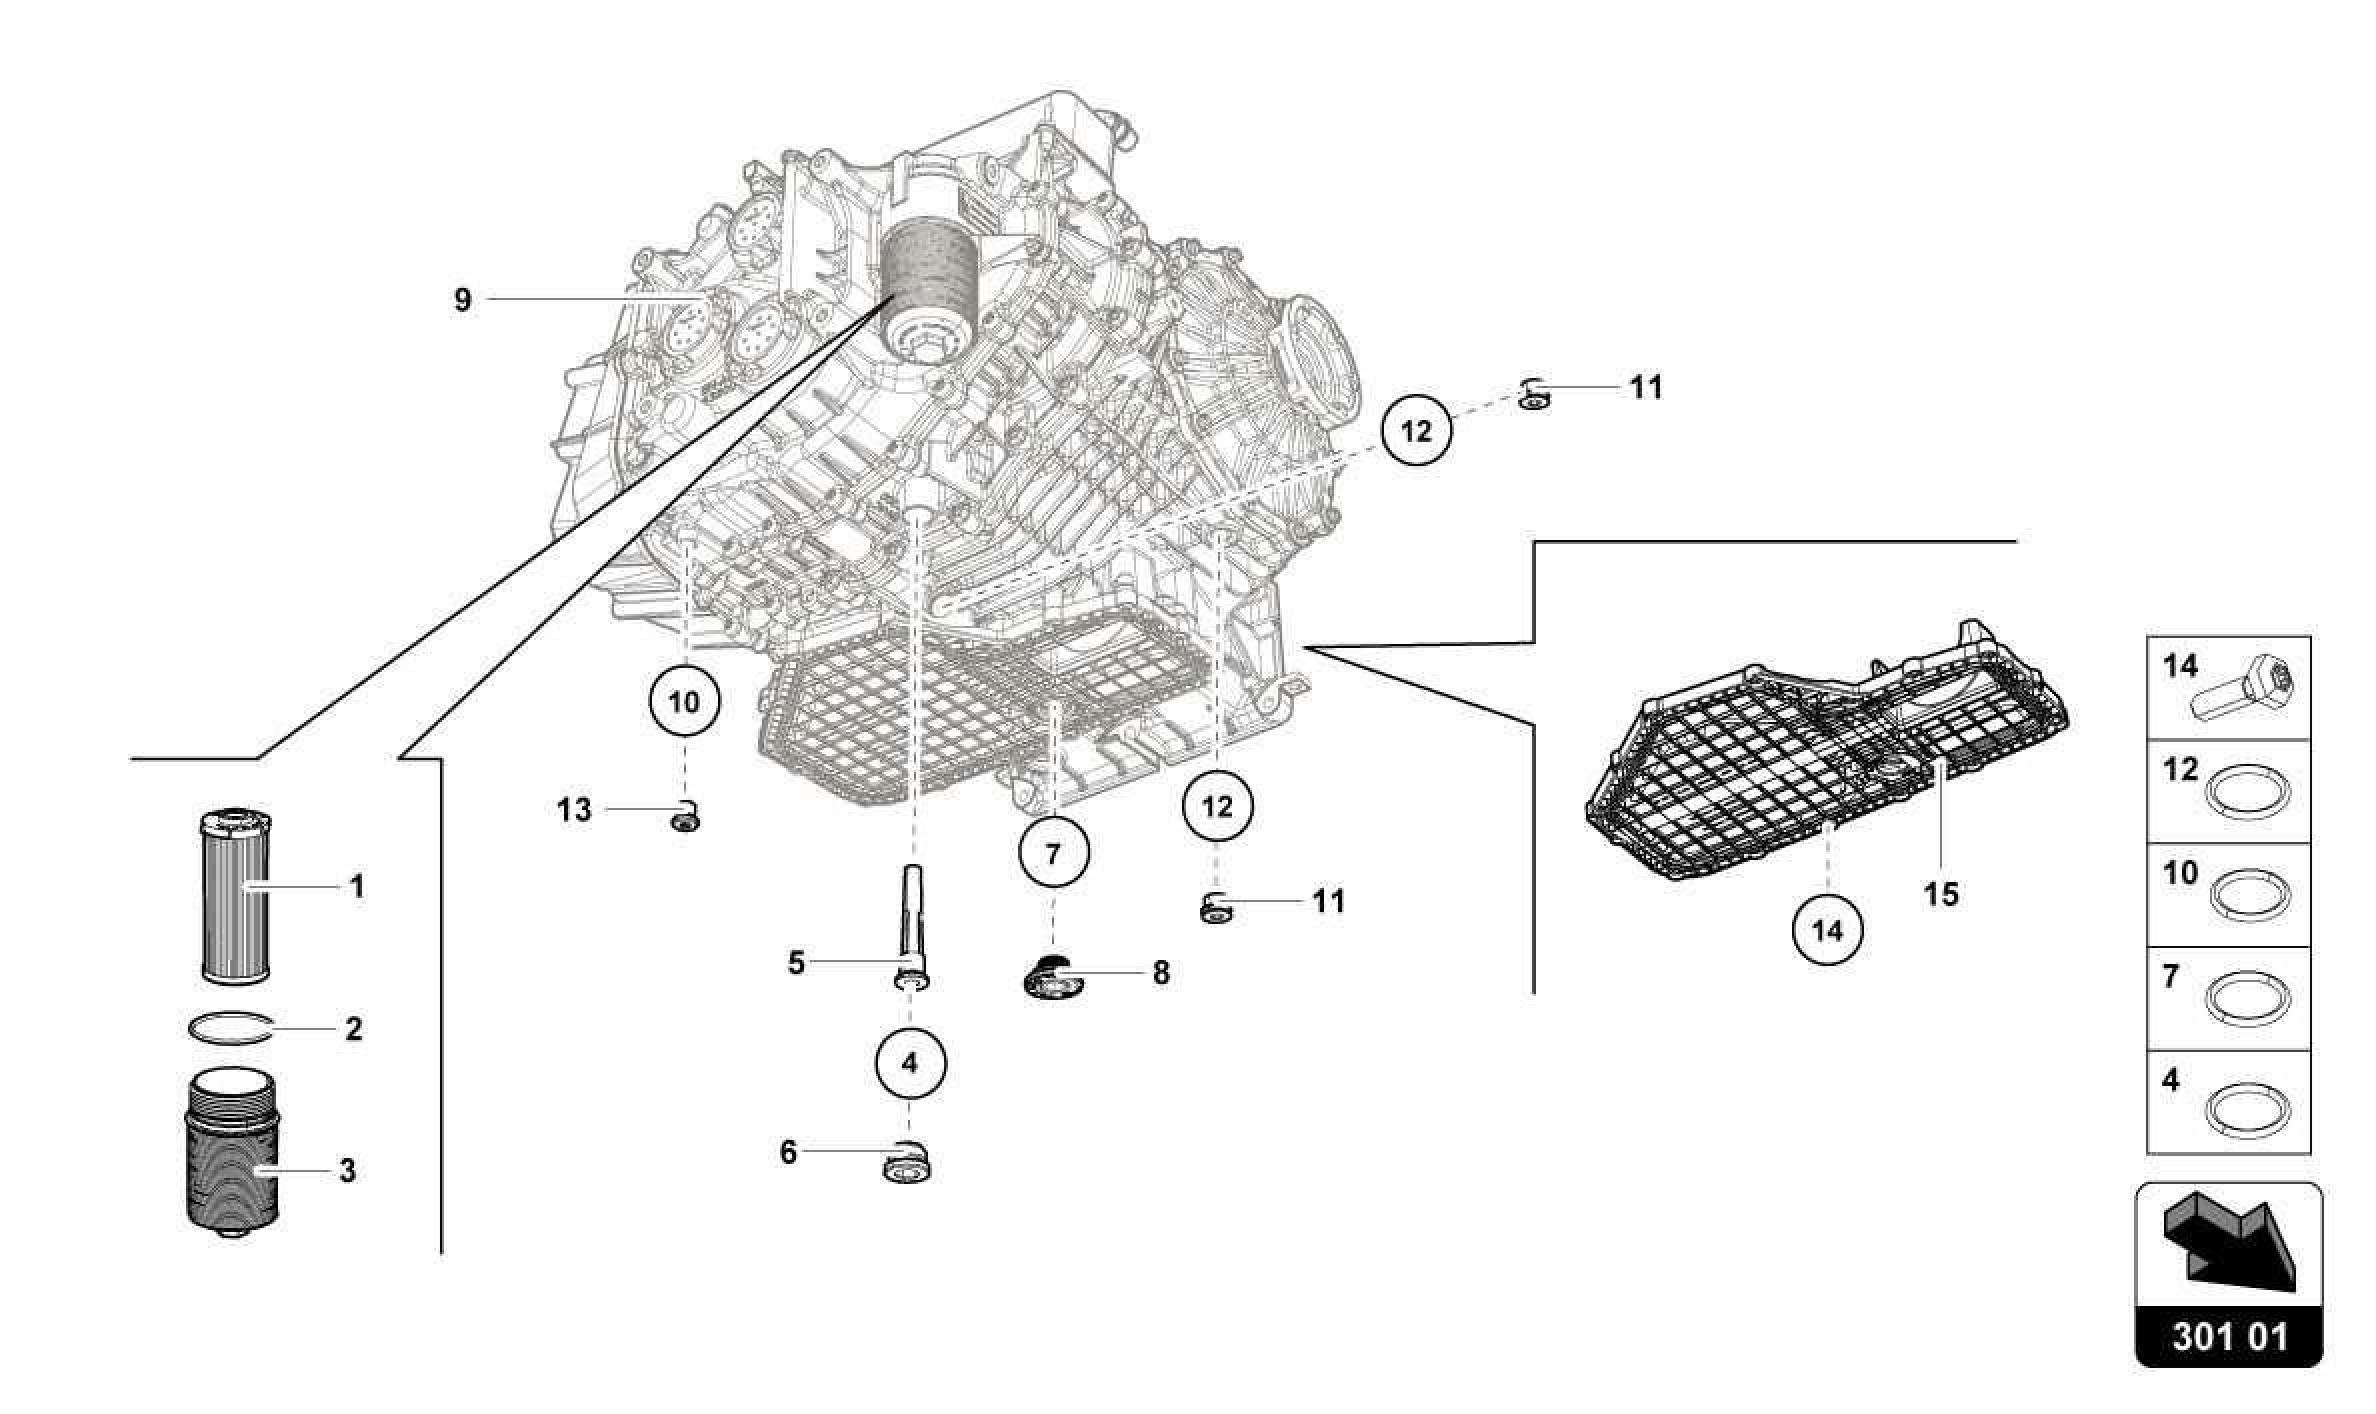 Lamborghini Huracan Lp610 4 Usa Gearbox Oil Filter